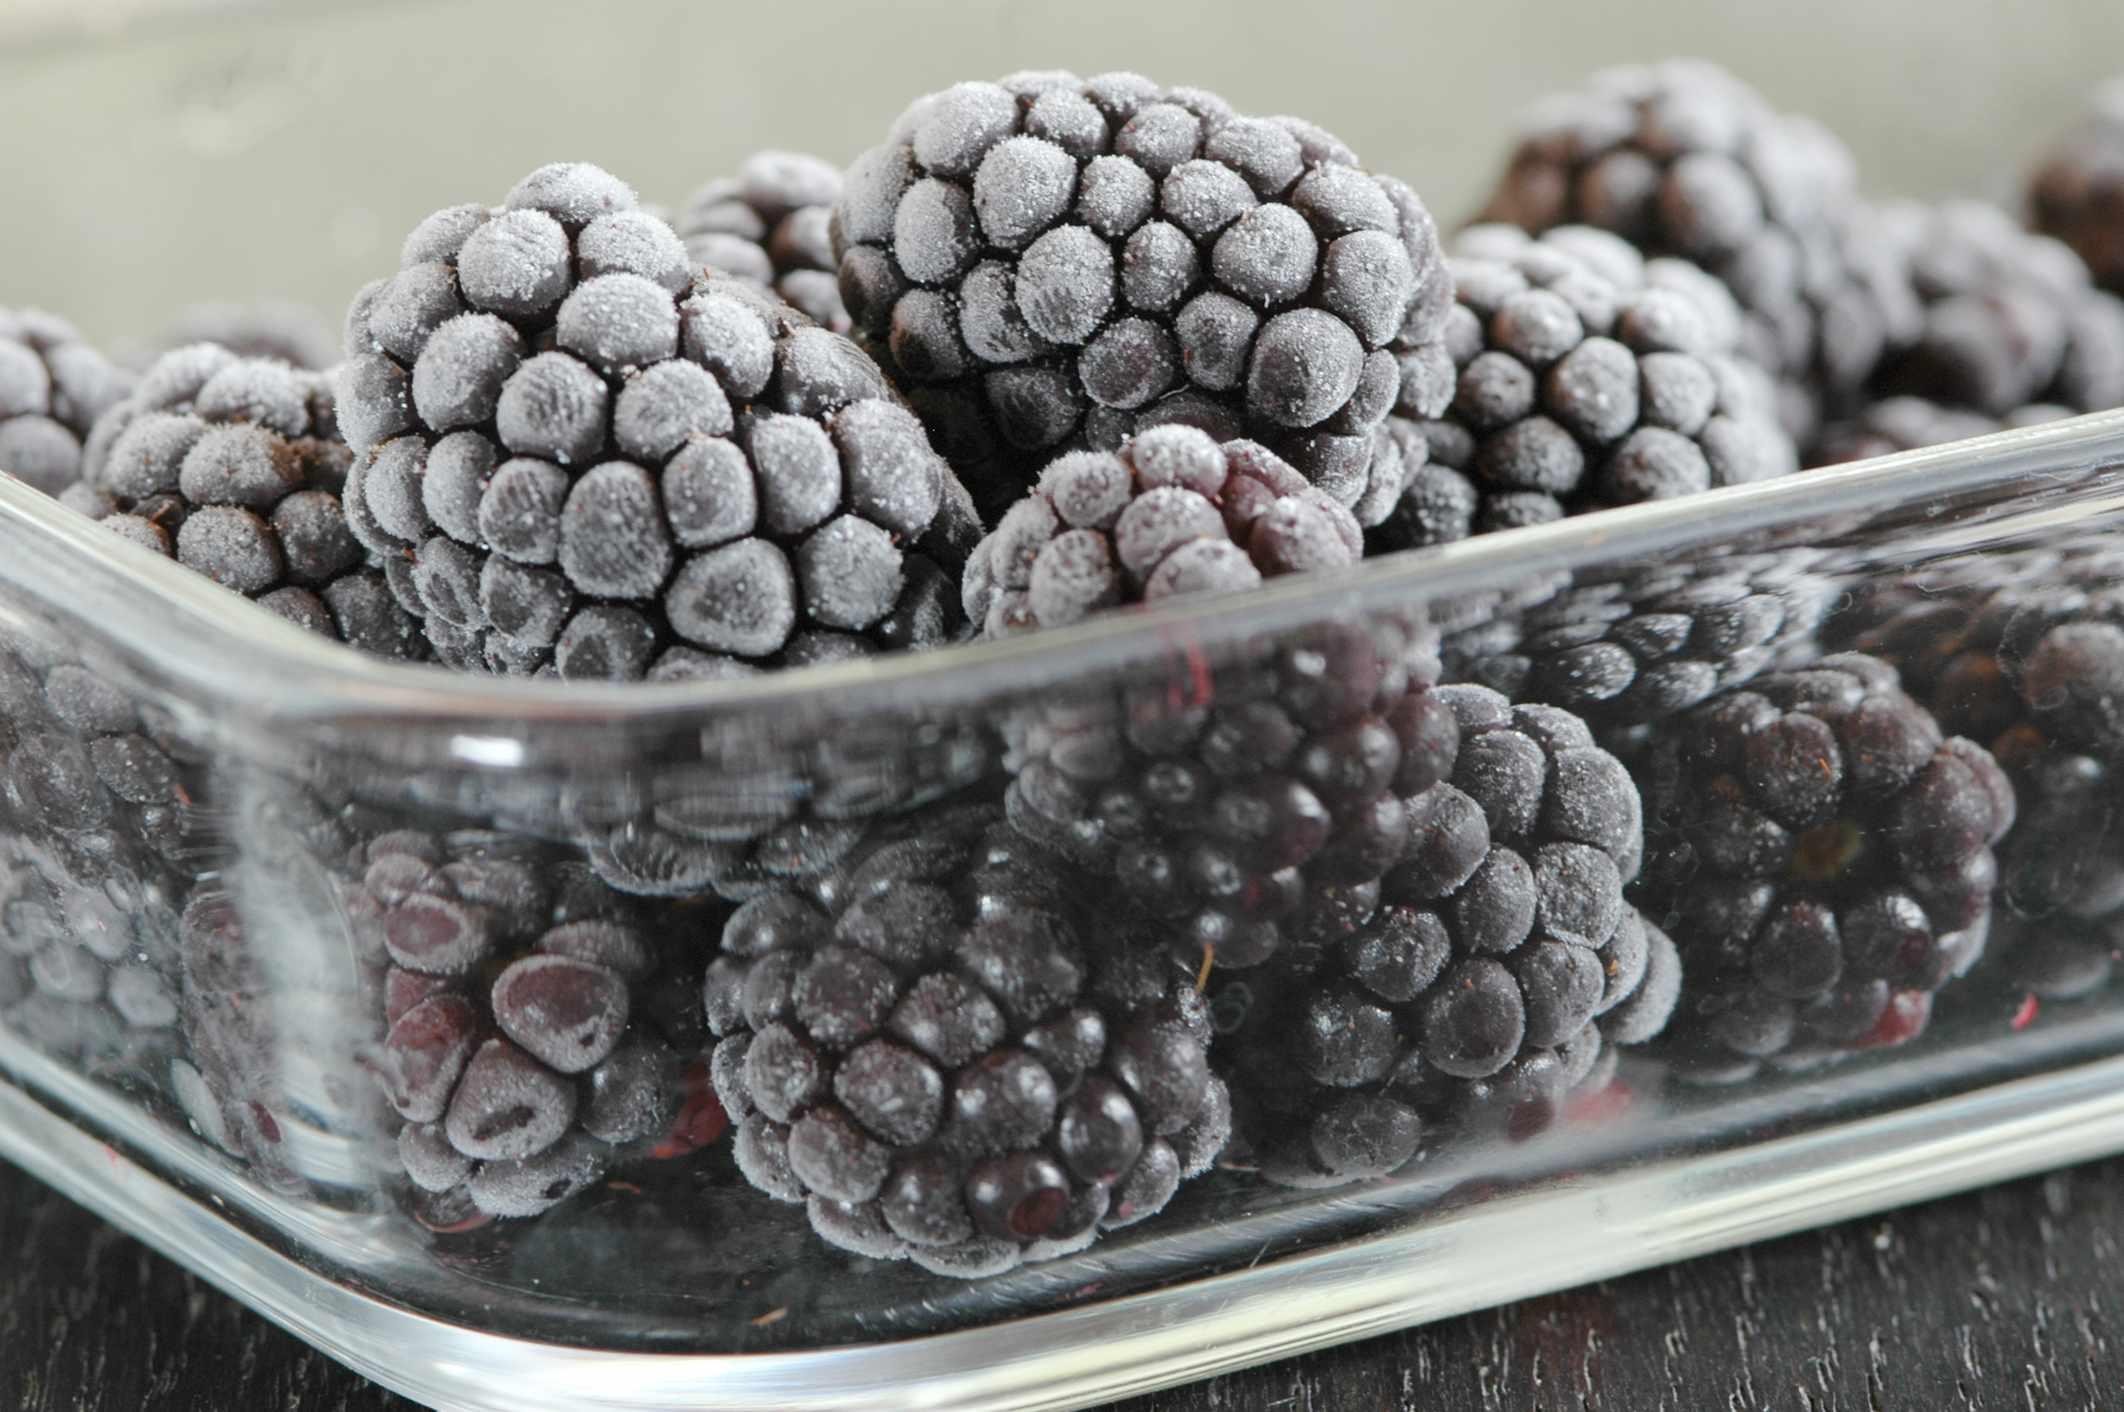 Frozen blackberries. © Westend61/Getty